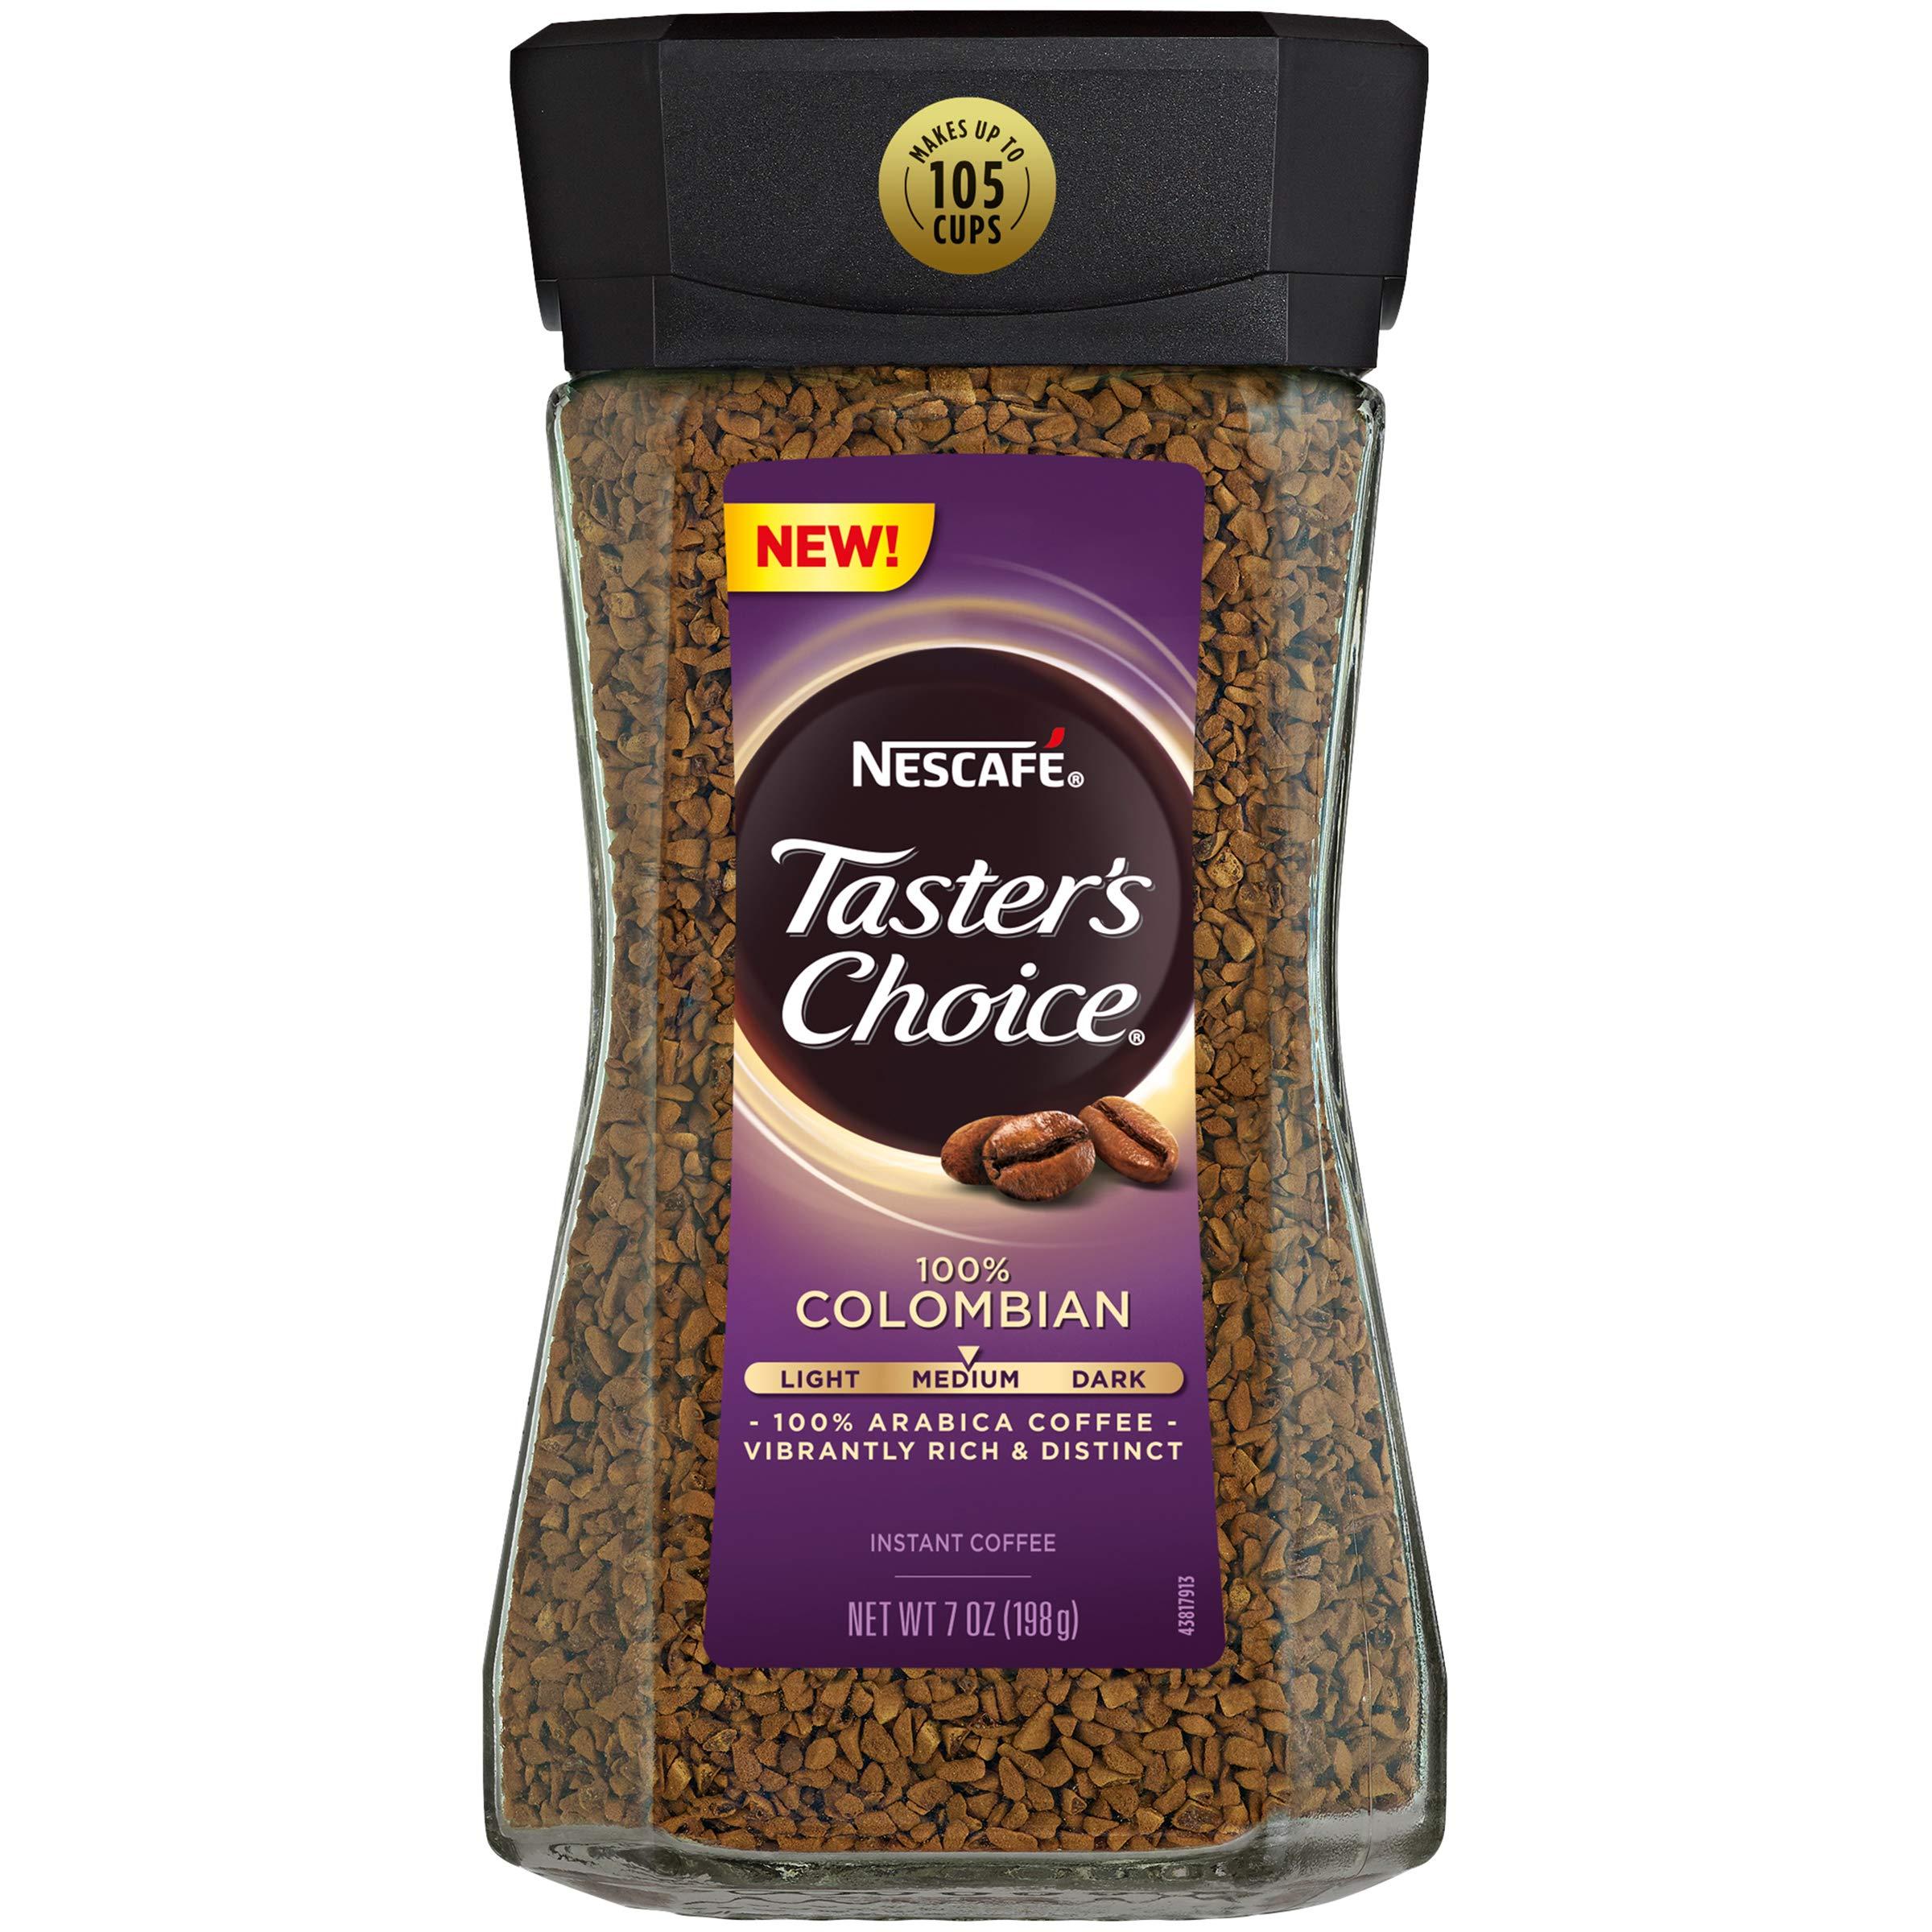 Nescafe Taster's Choice 100% Colombian Medium Roast Instant Coffee, 100% Colombian Medium Roast, 4Count